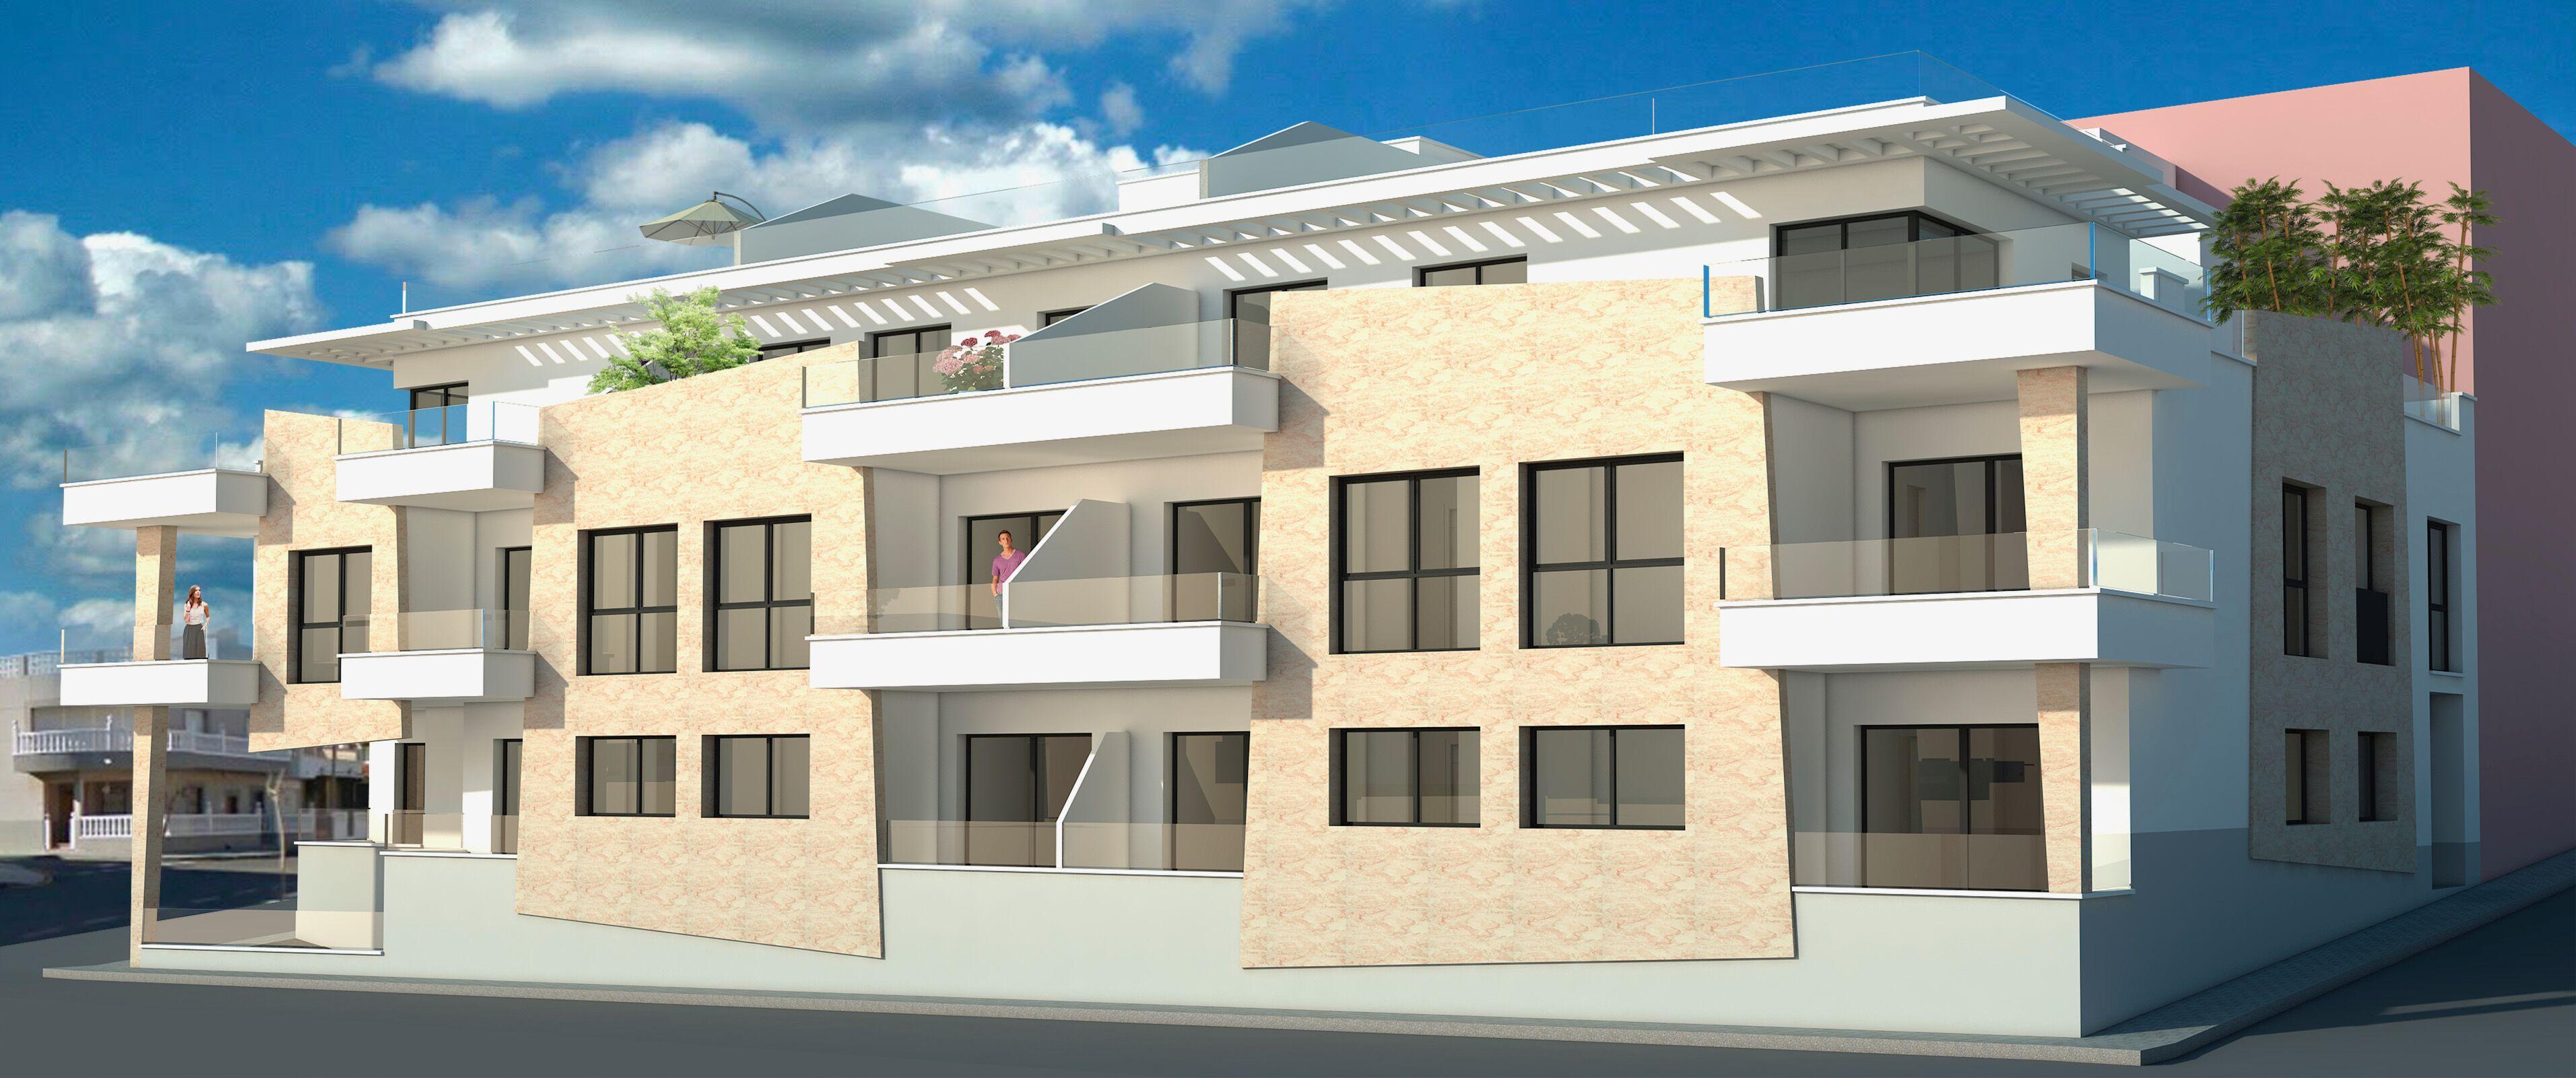 kf943606: Apartment for sale in Torre de la Horadada